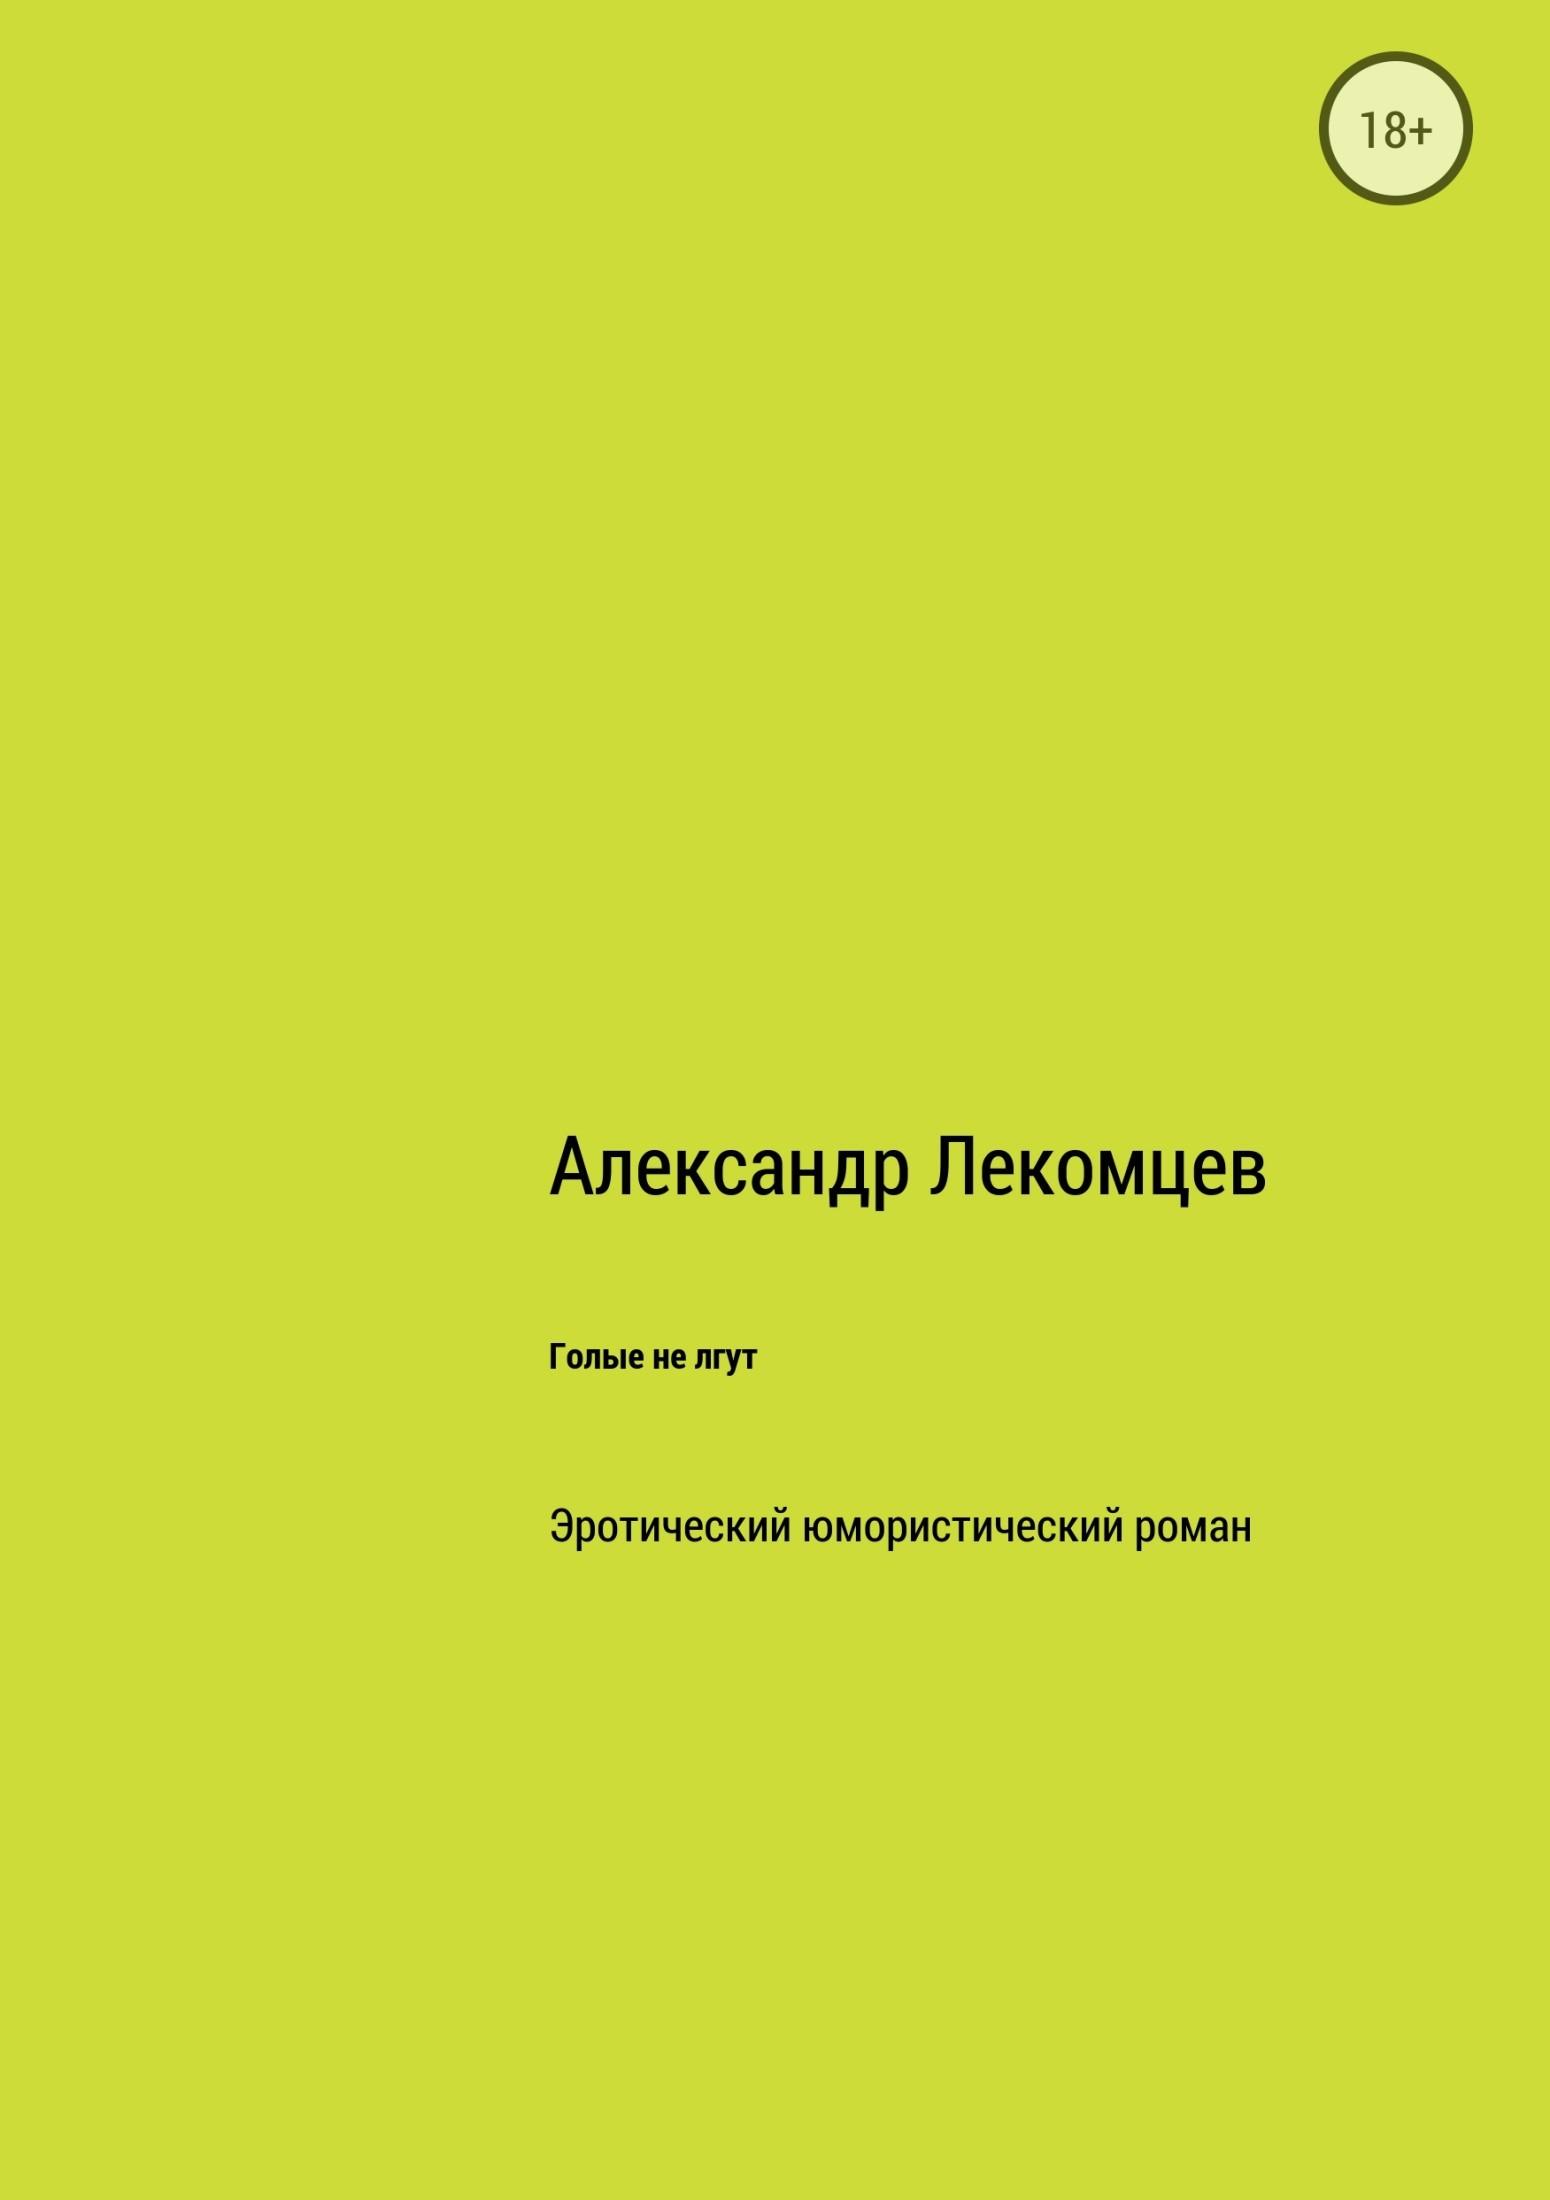 Александр Лекомцев - Голые не лгут